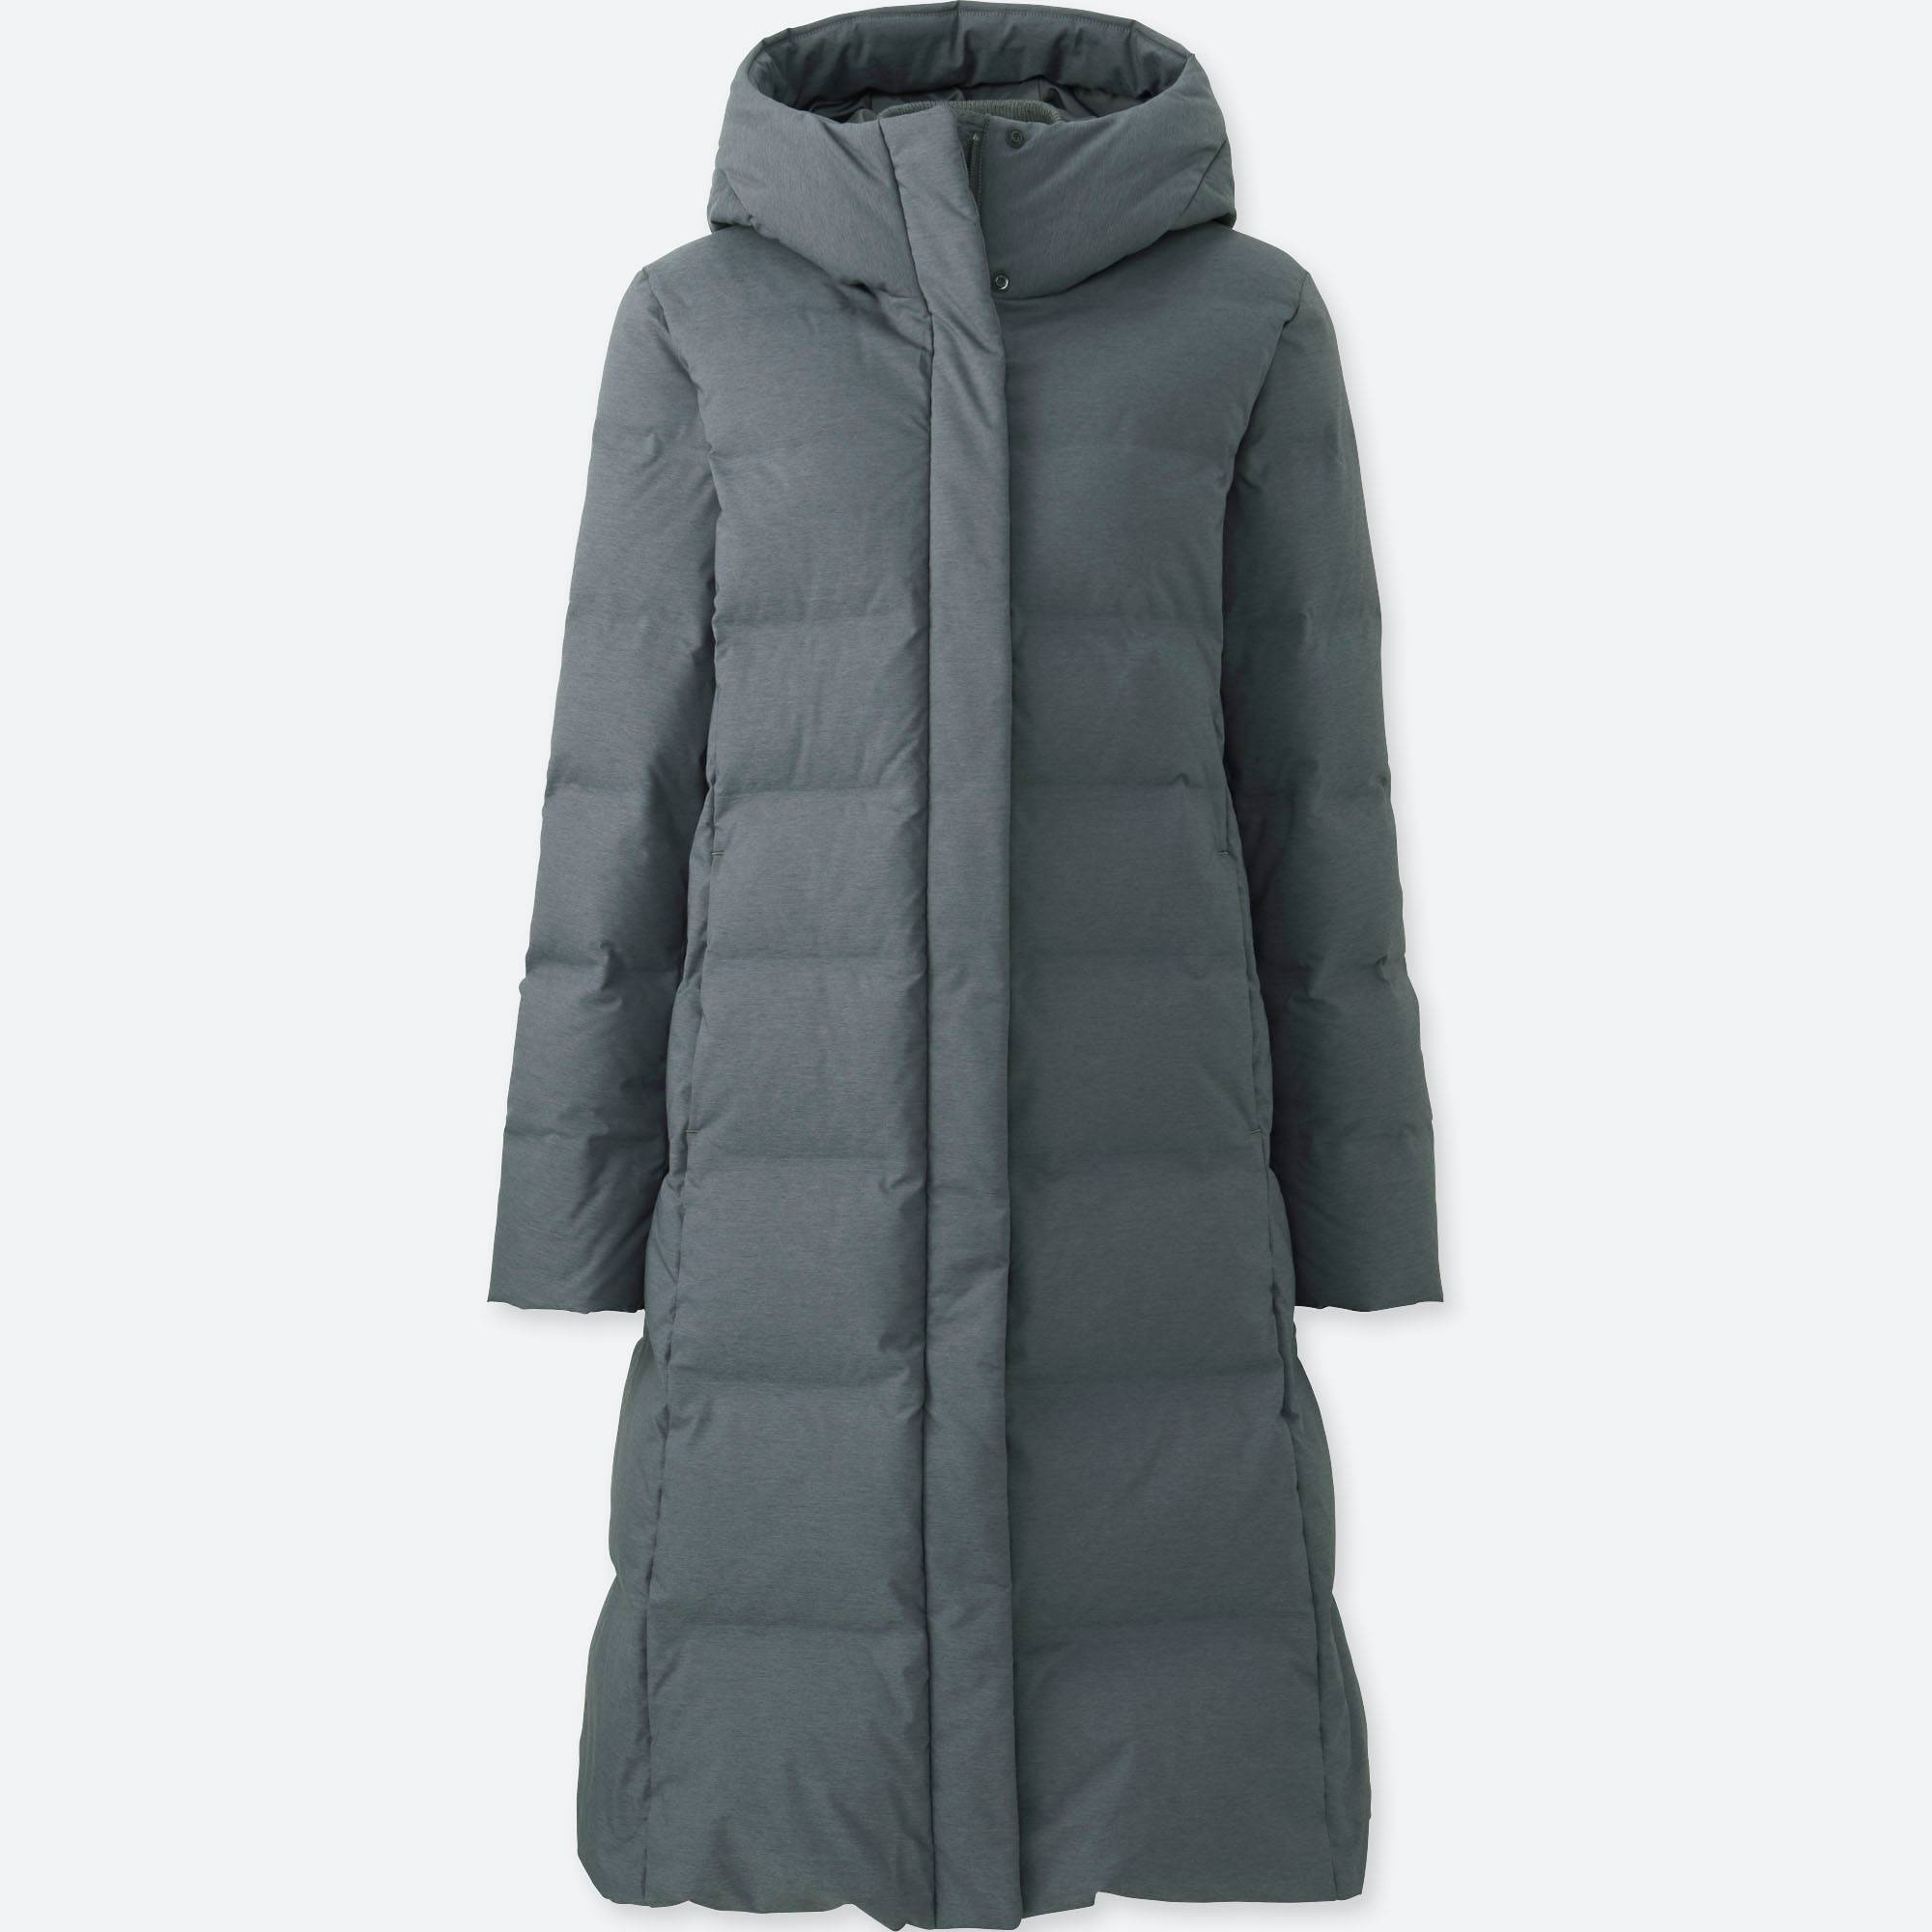 Uniqlo women's long jacket